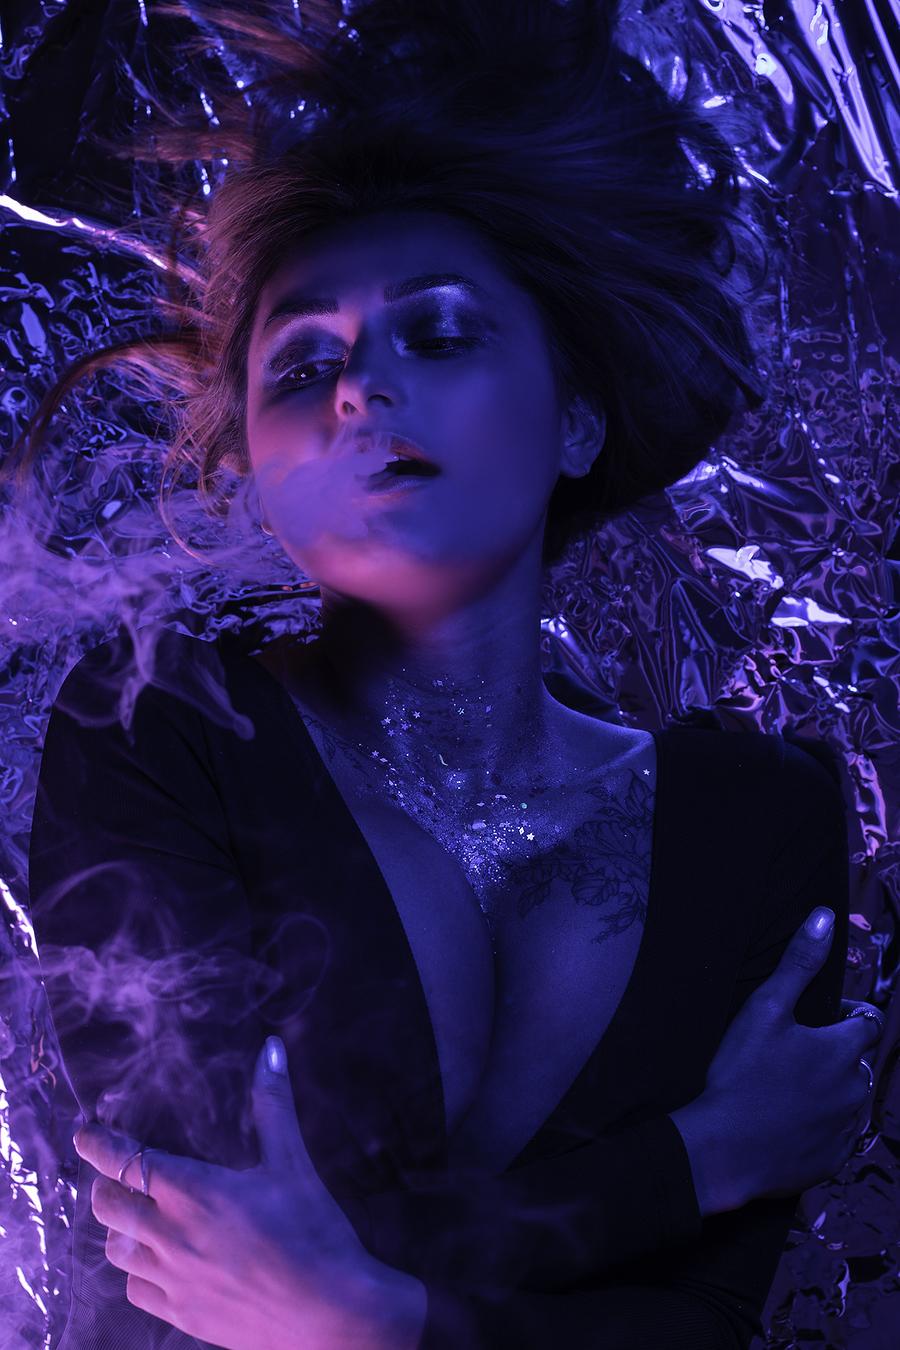 Smoke and mirrors / Photography by Inspire Studios Ltd, Model SamJaz, Taken at Inspire Studios Ltd / Uploaded 5th April 2019 @ 08:49 PM